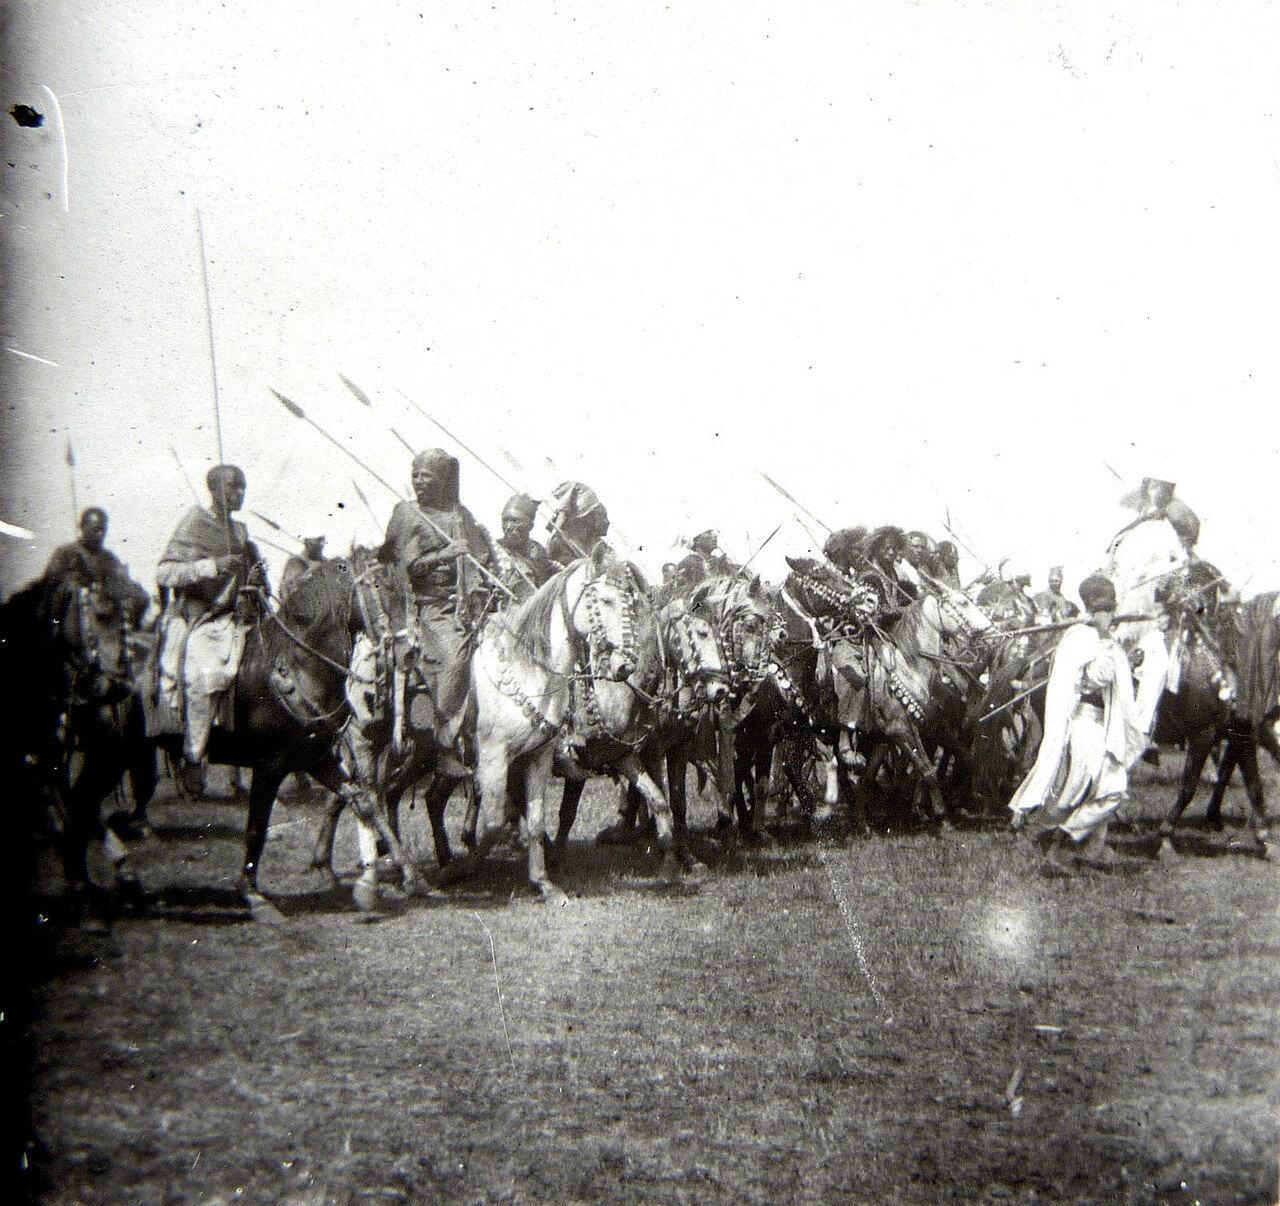 1897. Абиссиния.  Всадники на дороге Джибутти - Аддис-Абеба